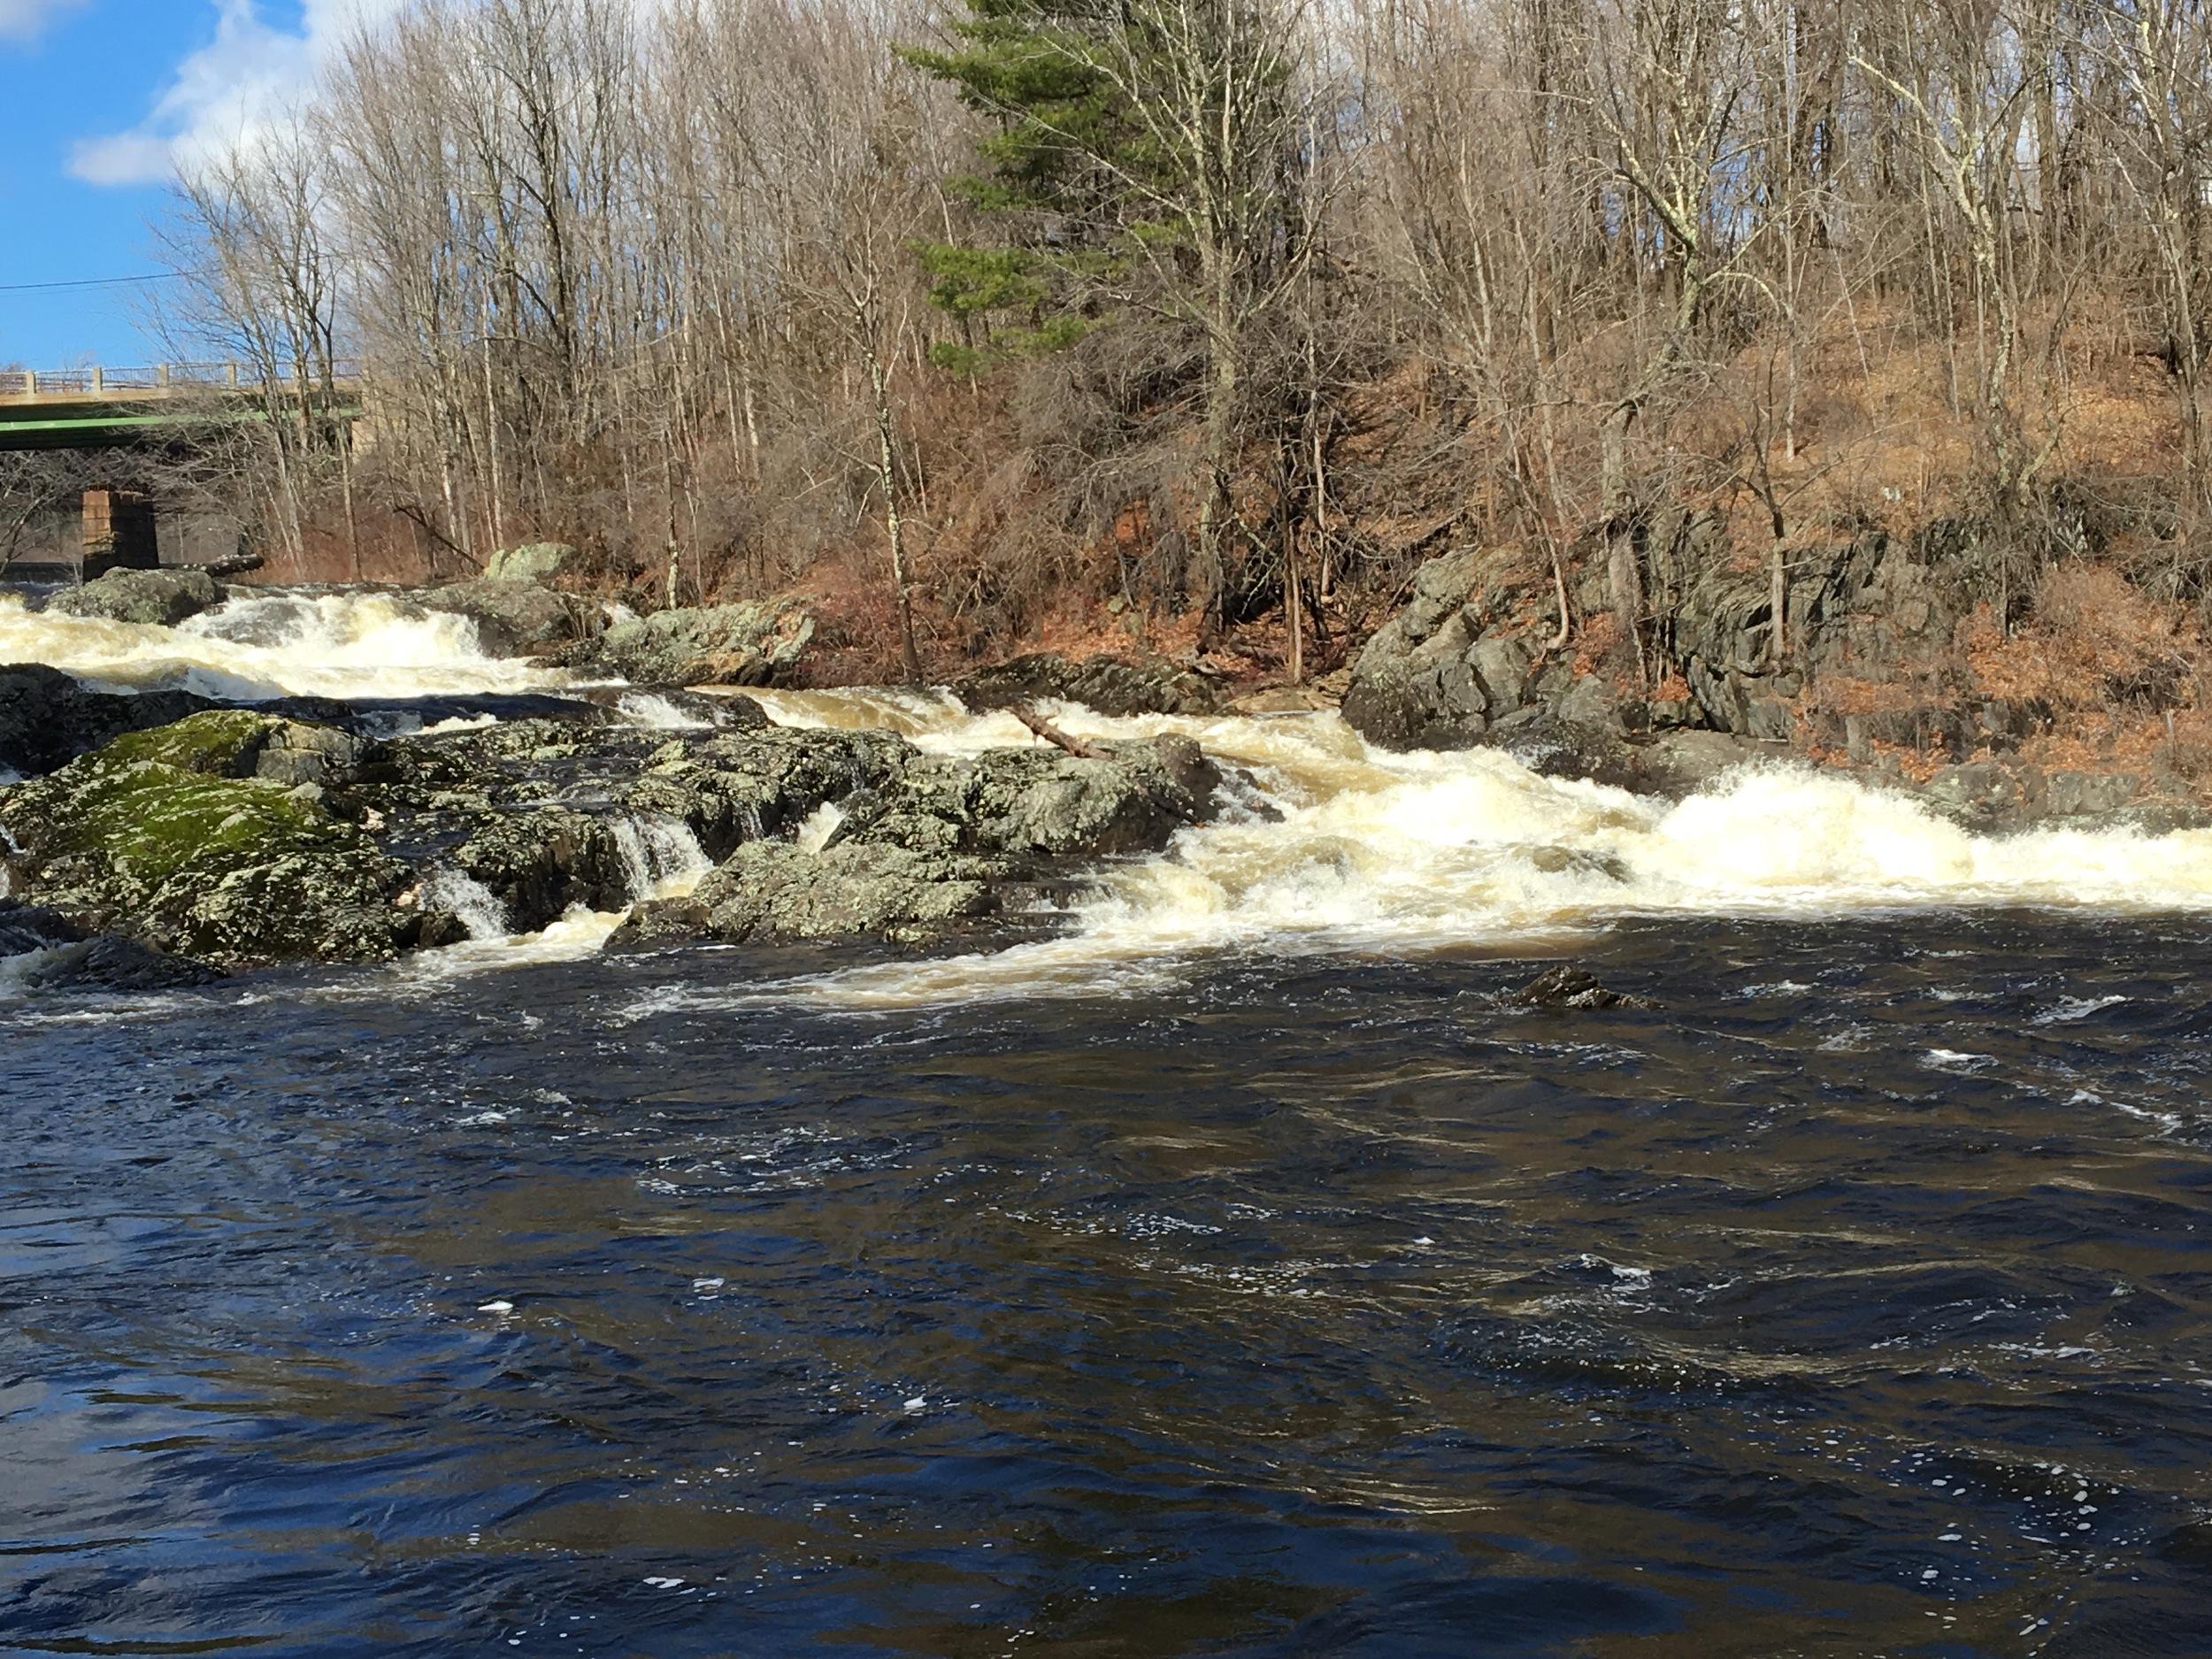 Salmon Falls from Below